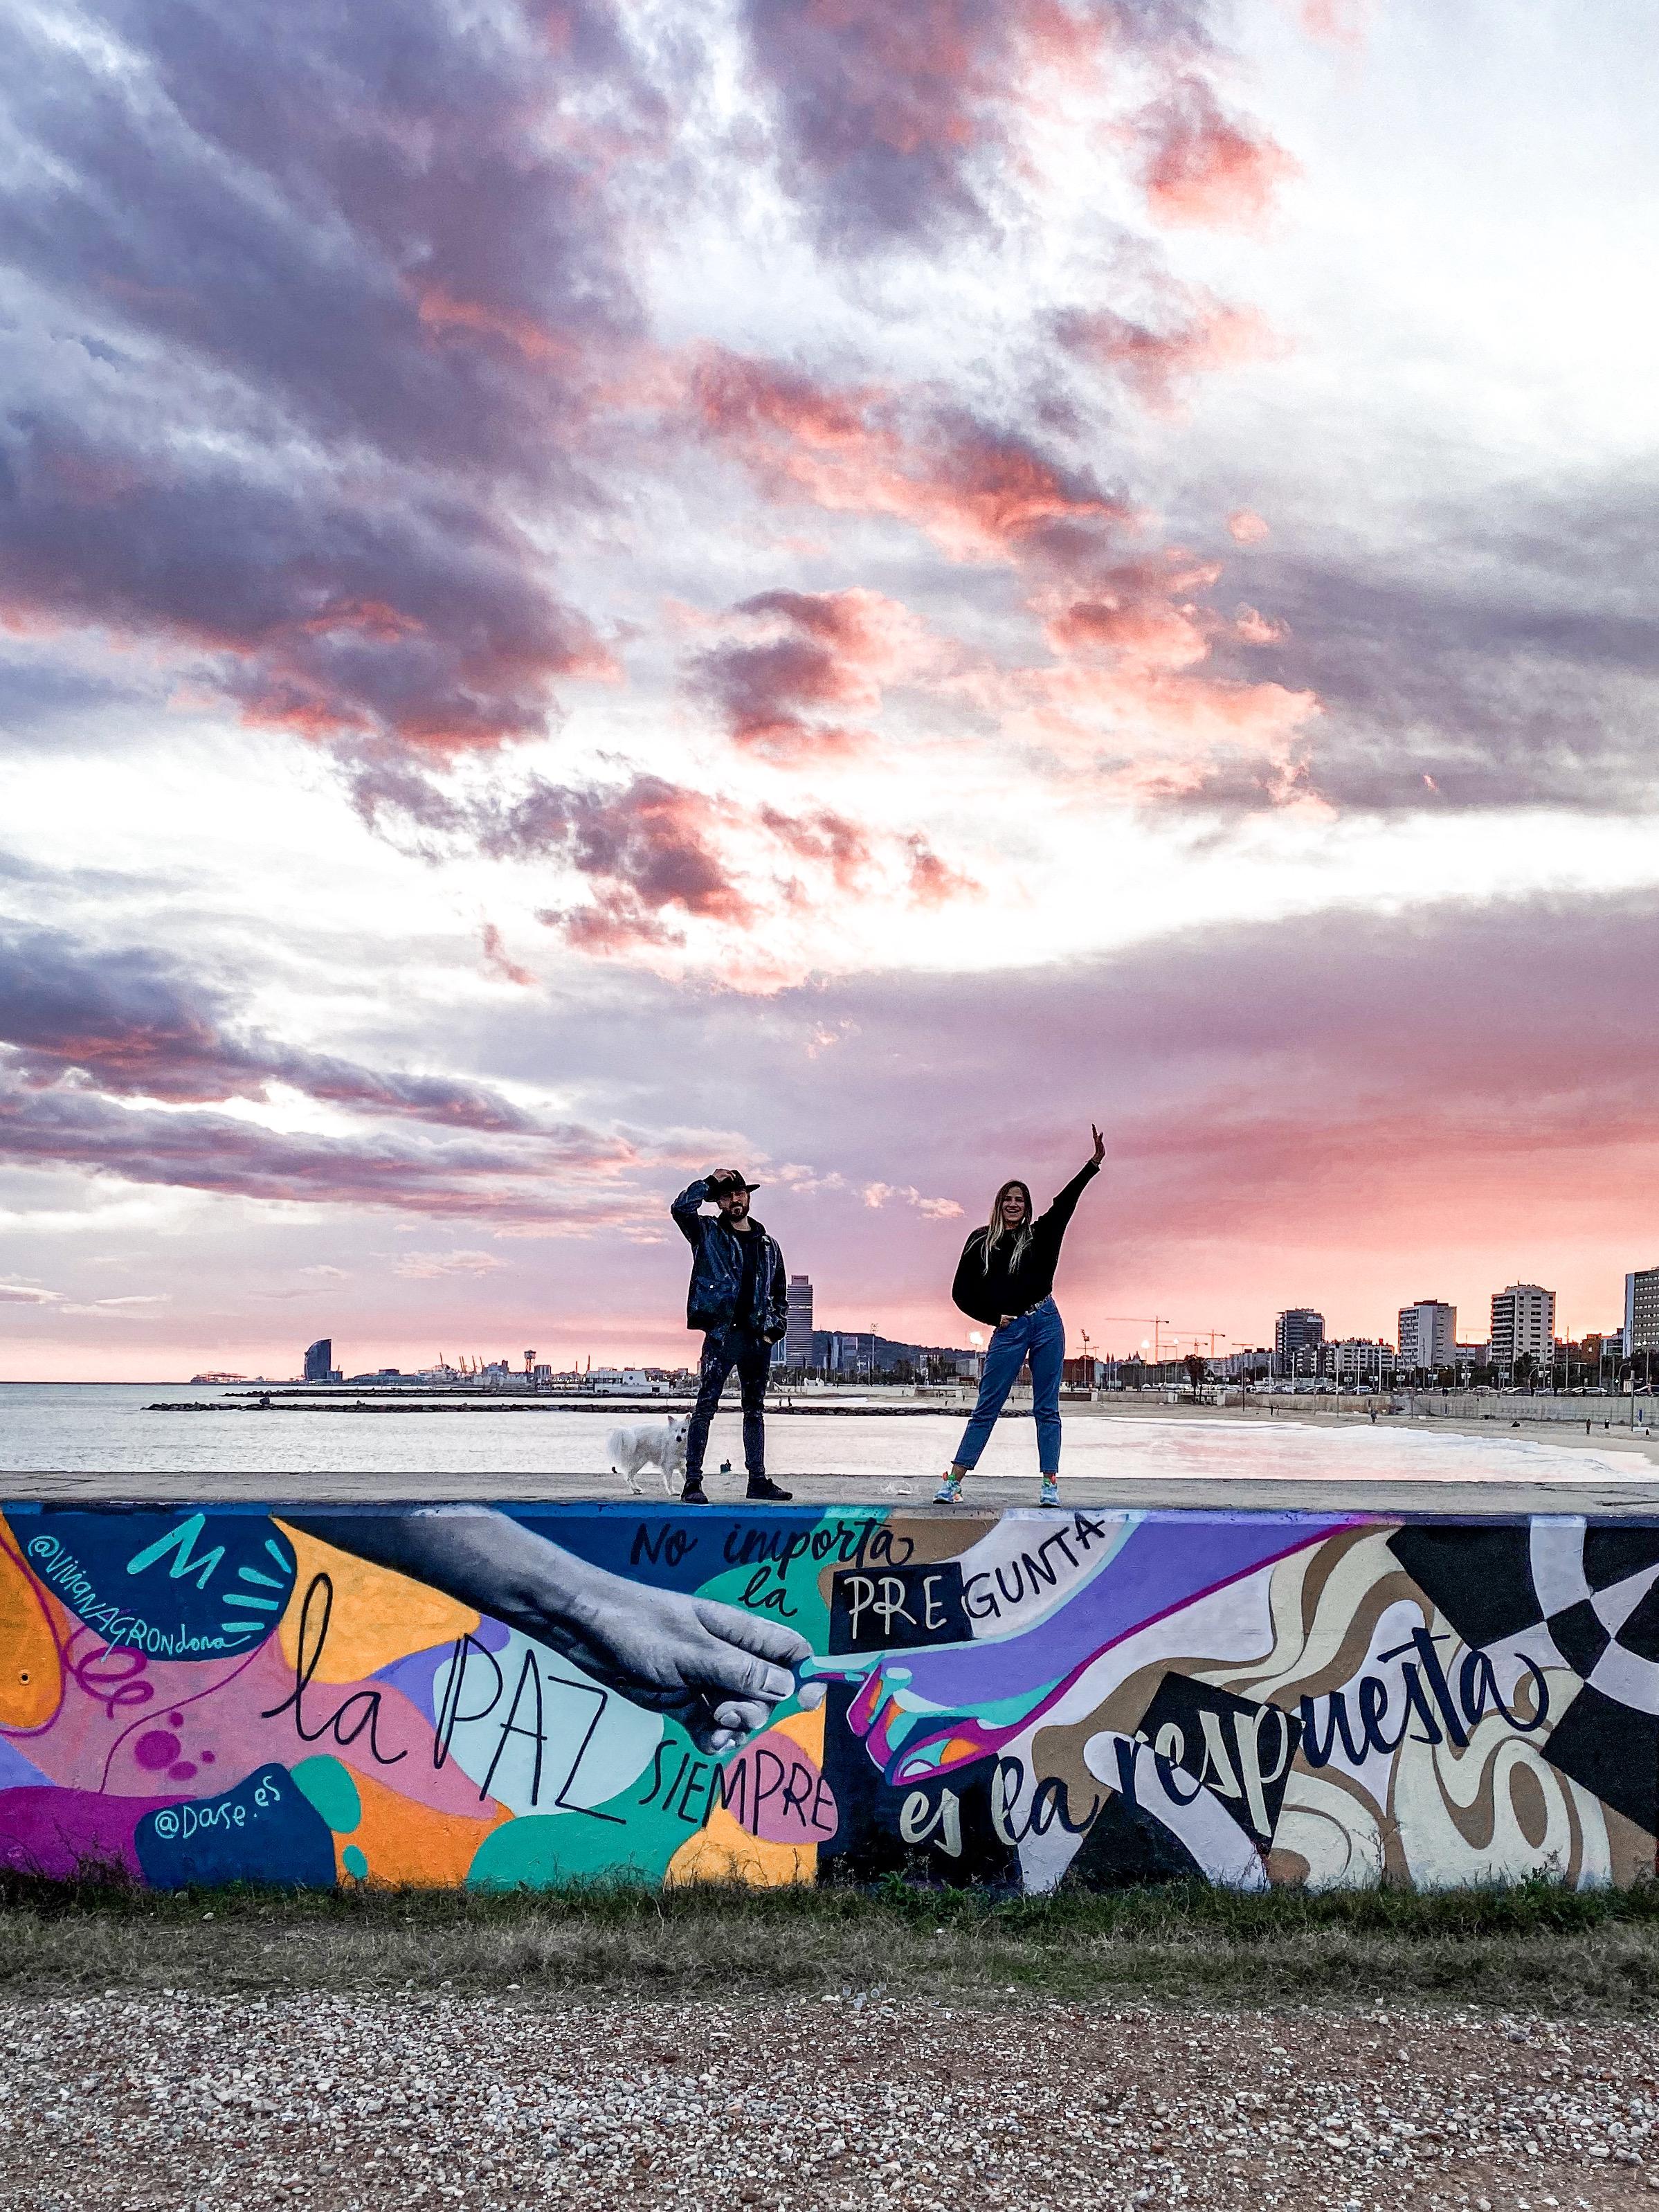 Viviana-grondona-wallpaper-frases-mural-graffiti-dase